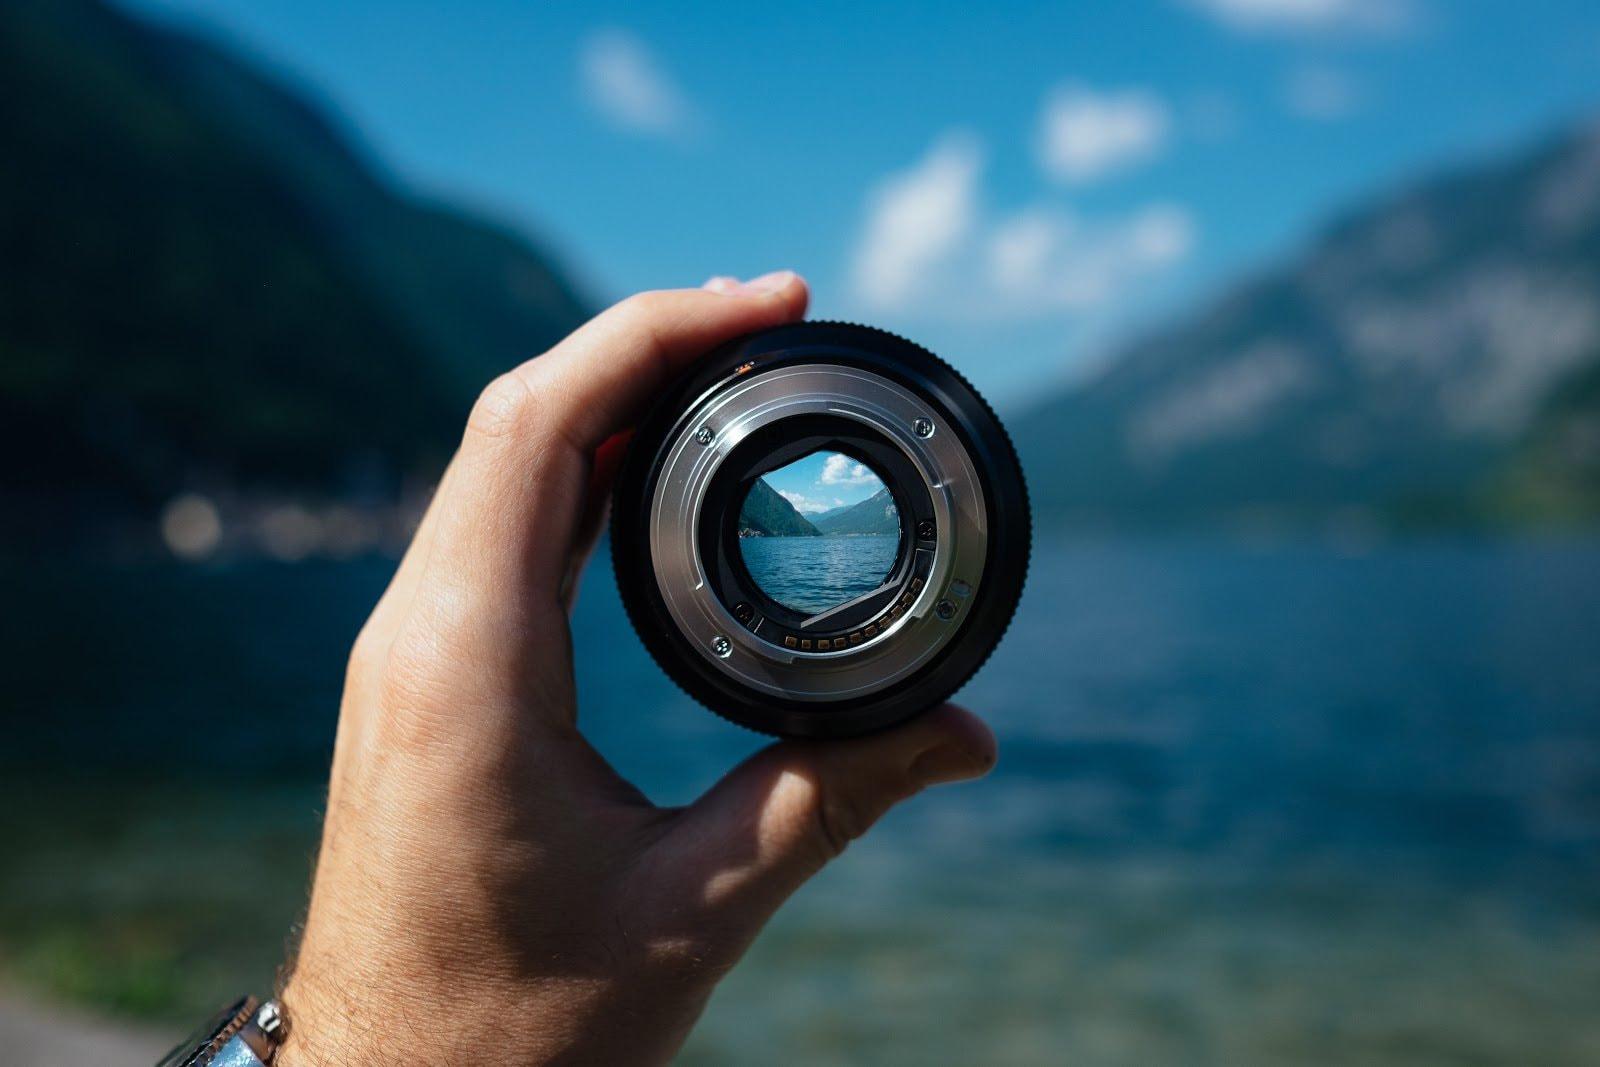 Lake and mountains seen through a camera lens by Paul Skorupskas